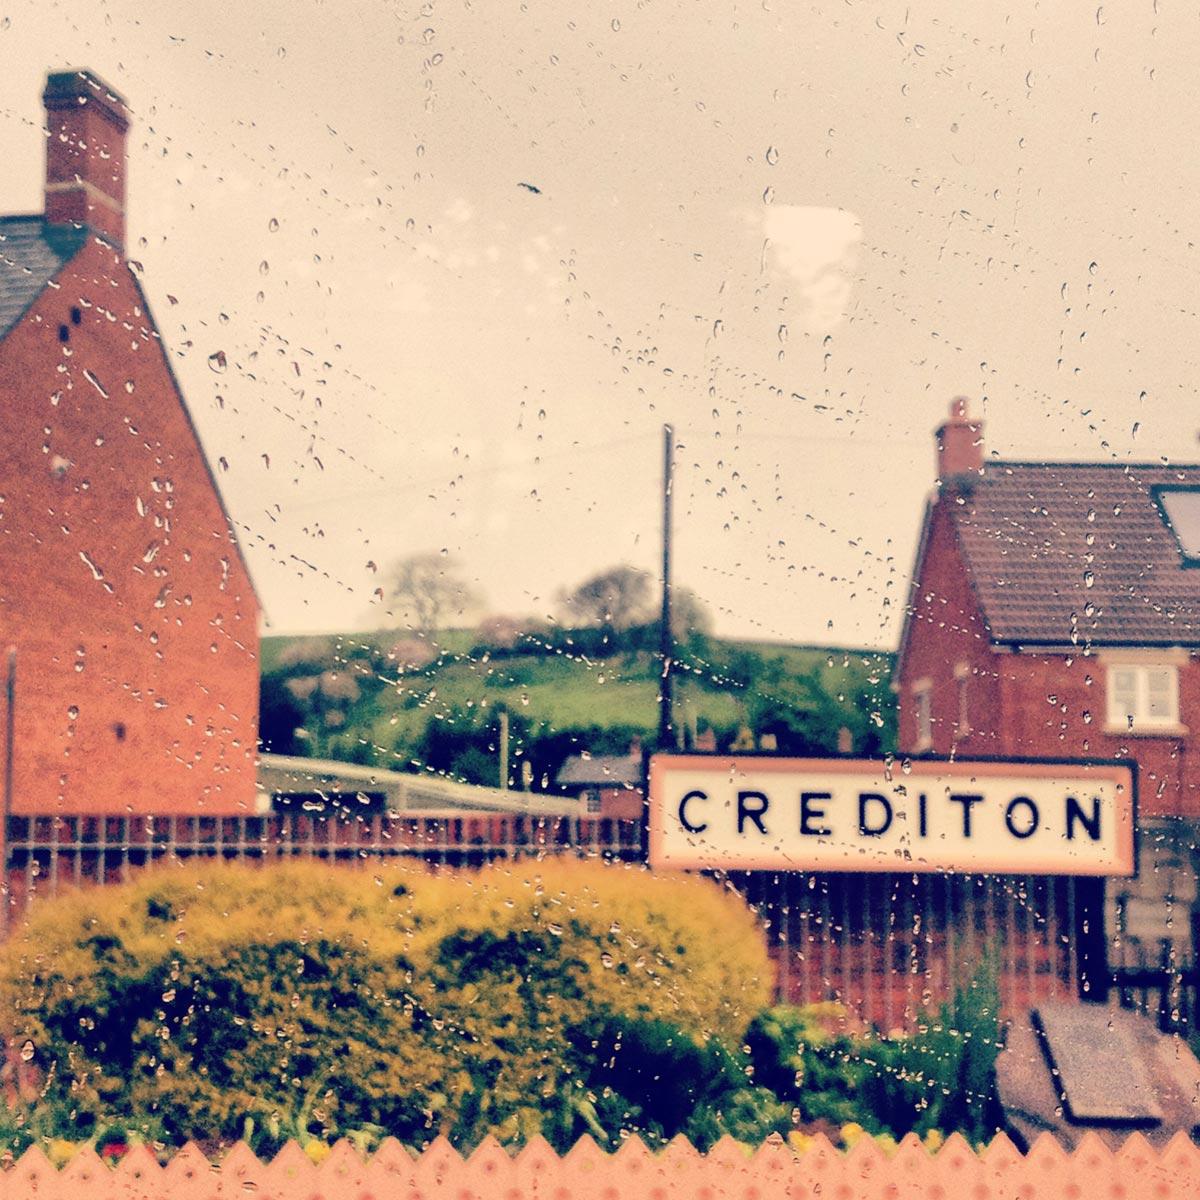 Crediton